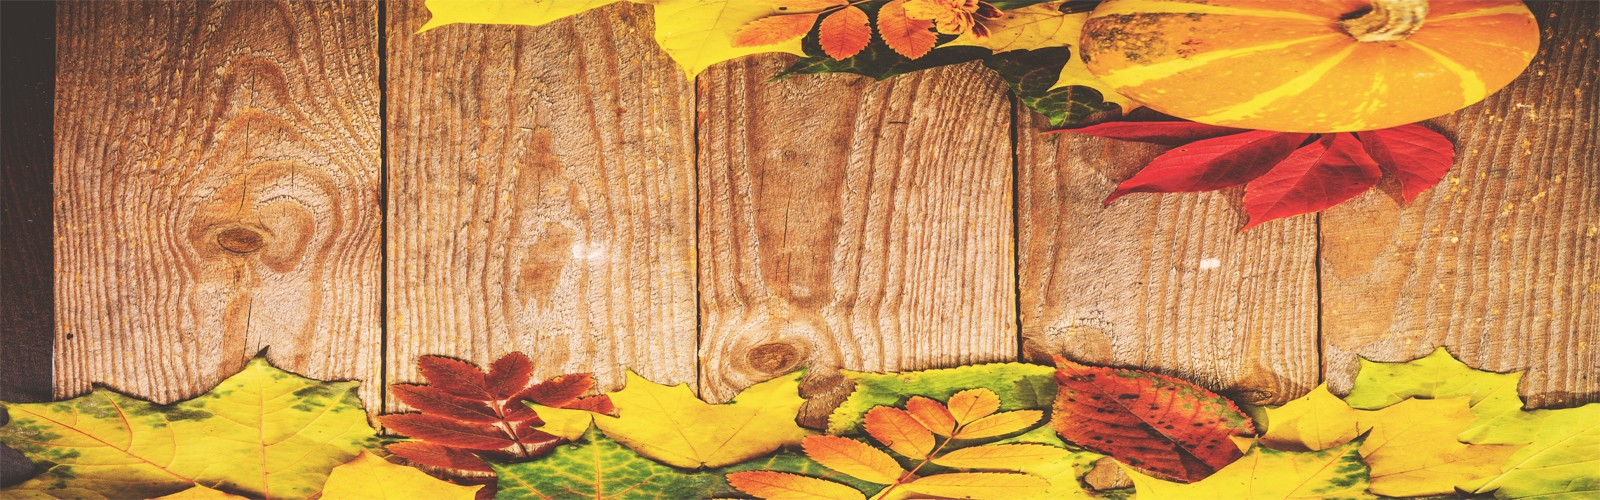 autumn holiday - blog - header